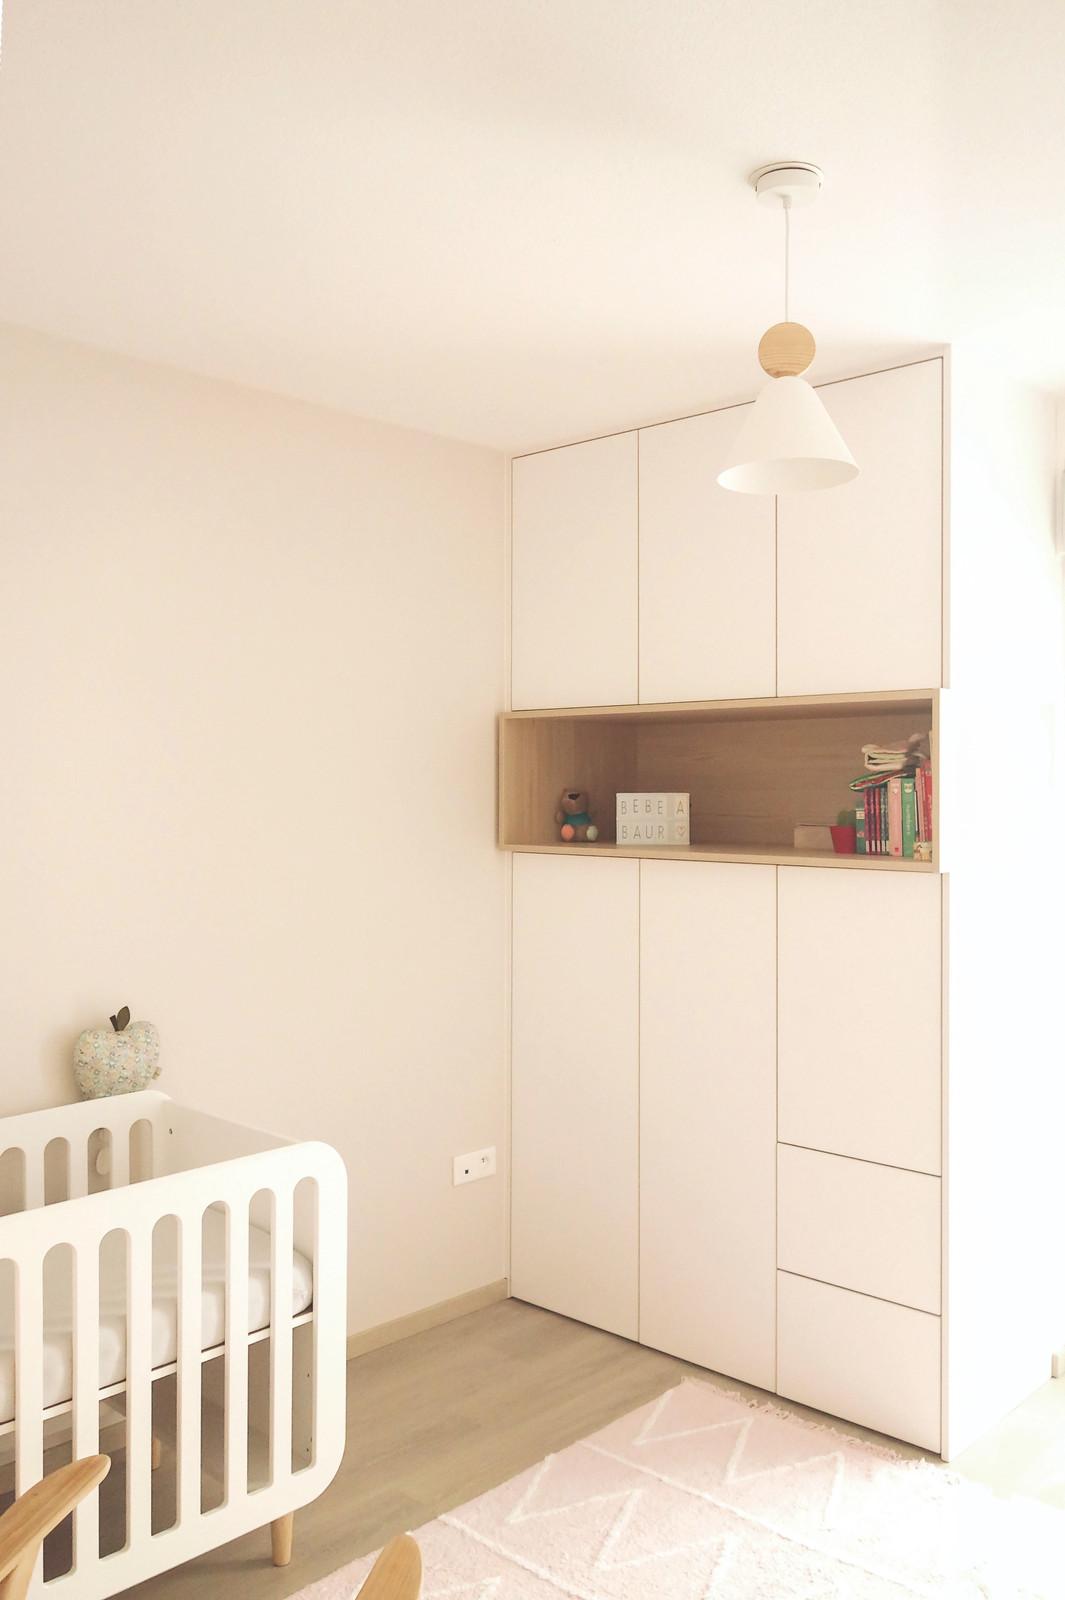 Agencement d 39 une chambre enfant schiltigheim - Agencement chambre ...